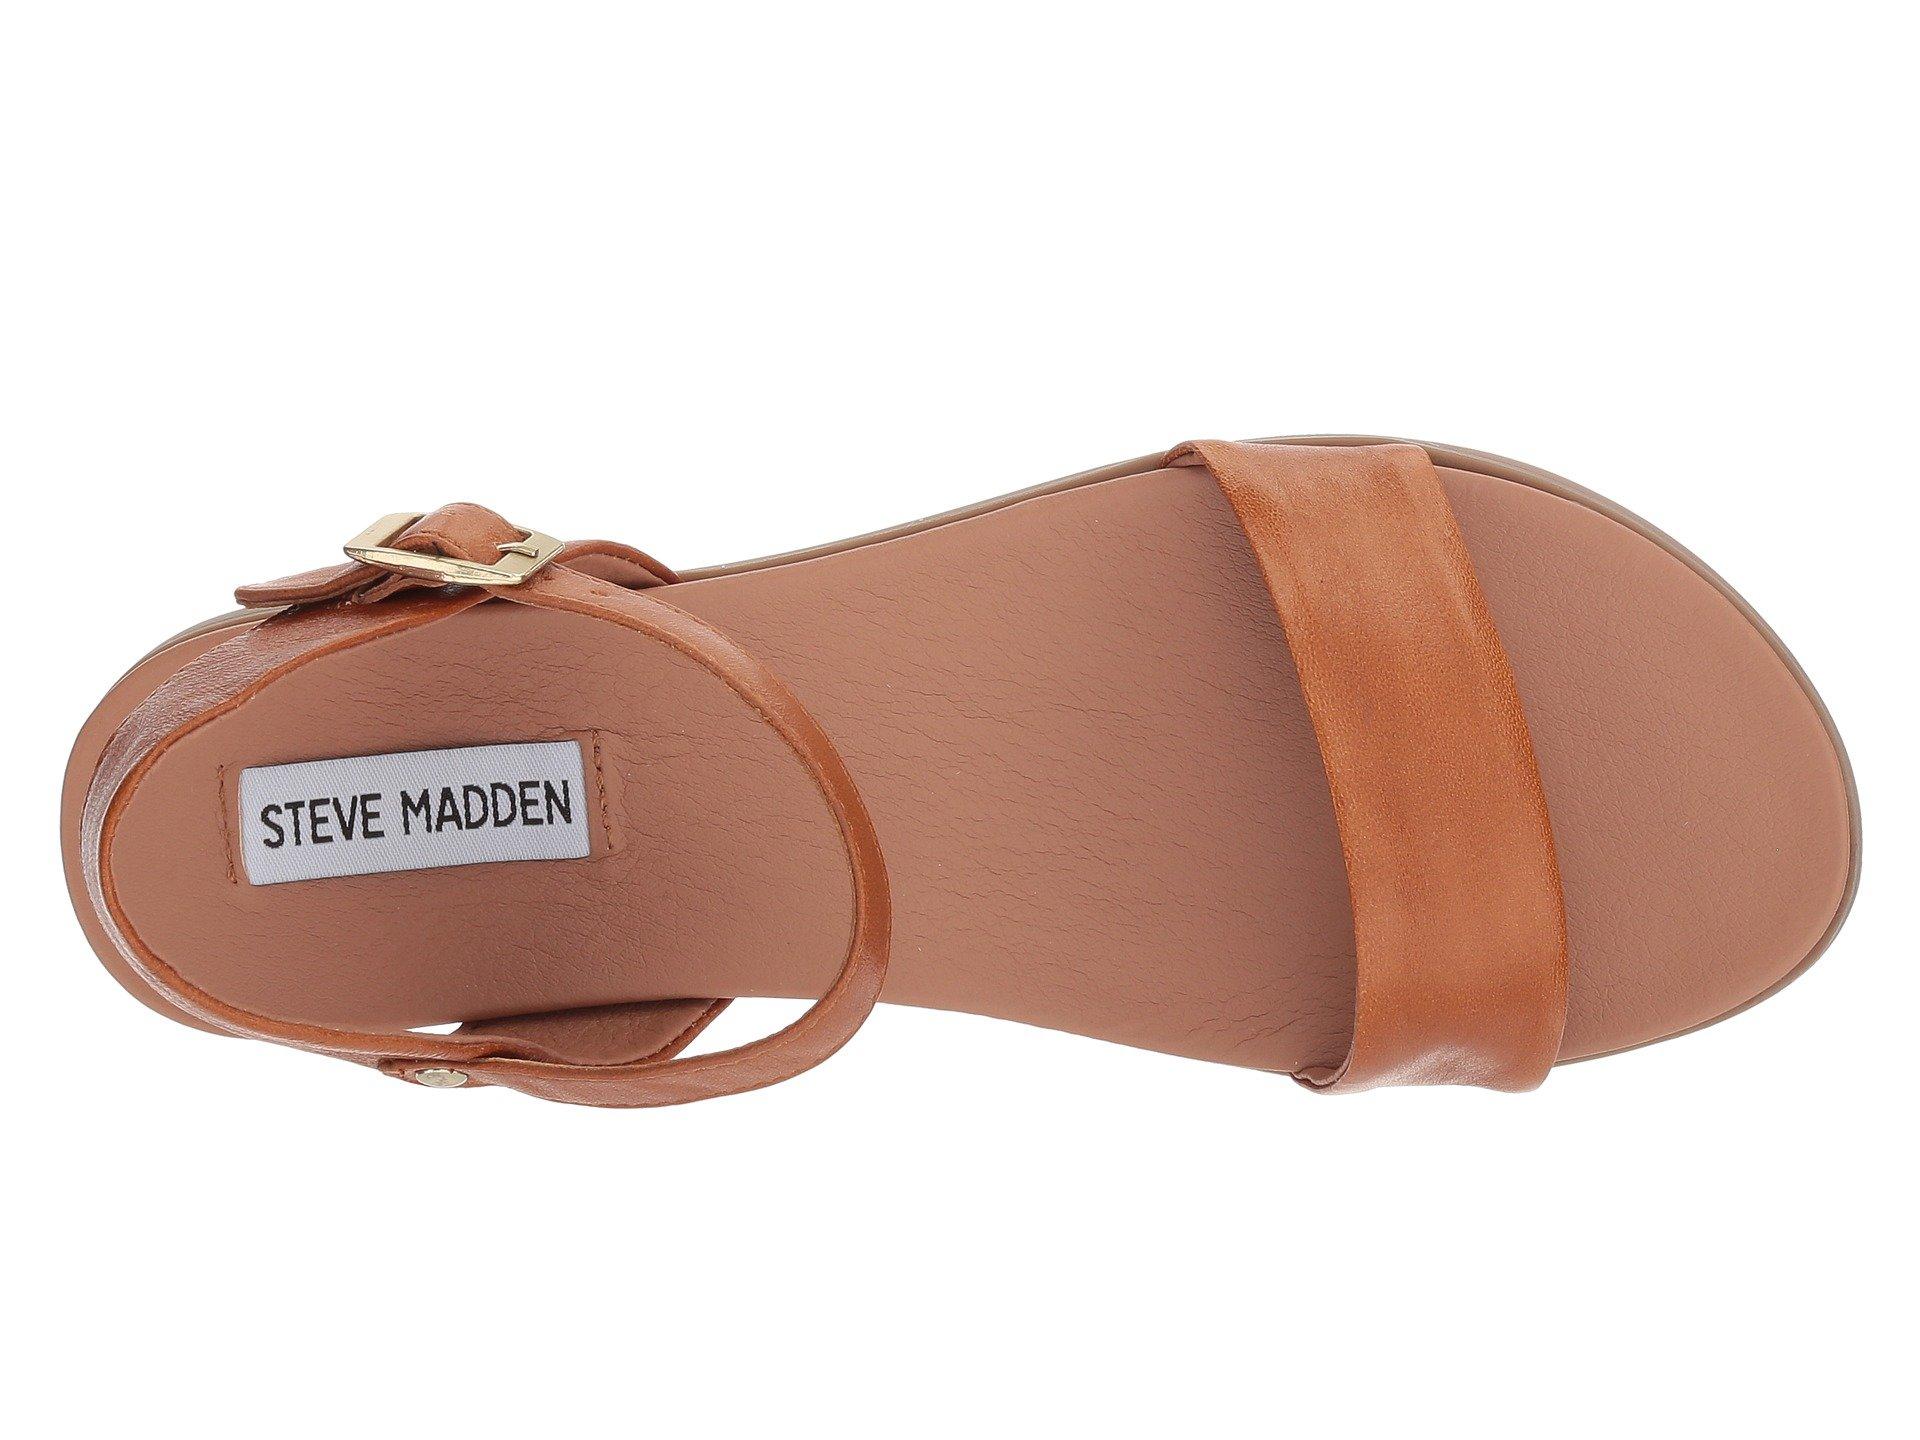 Dina Tan Madden Sandal Steve Leather qZRWYFnA